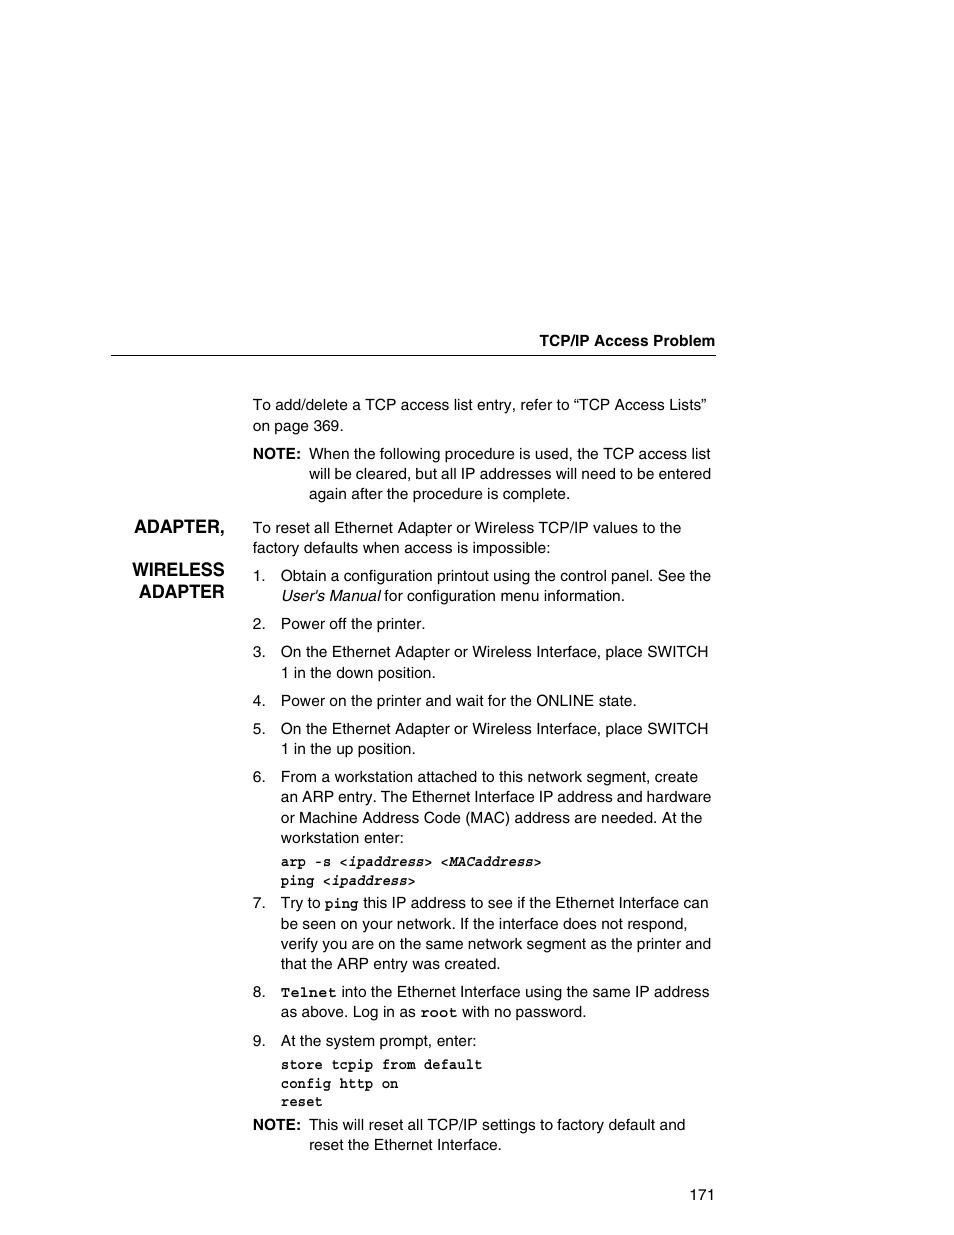 ibm infoprint 6500 user manual page 171 398 rh manualsdir com IBM Infoprint 6500 V1P Model IBM 6500 V2.0